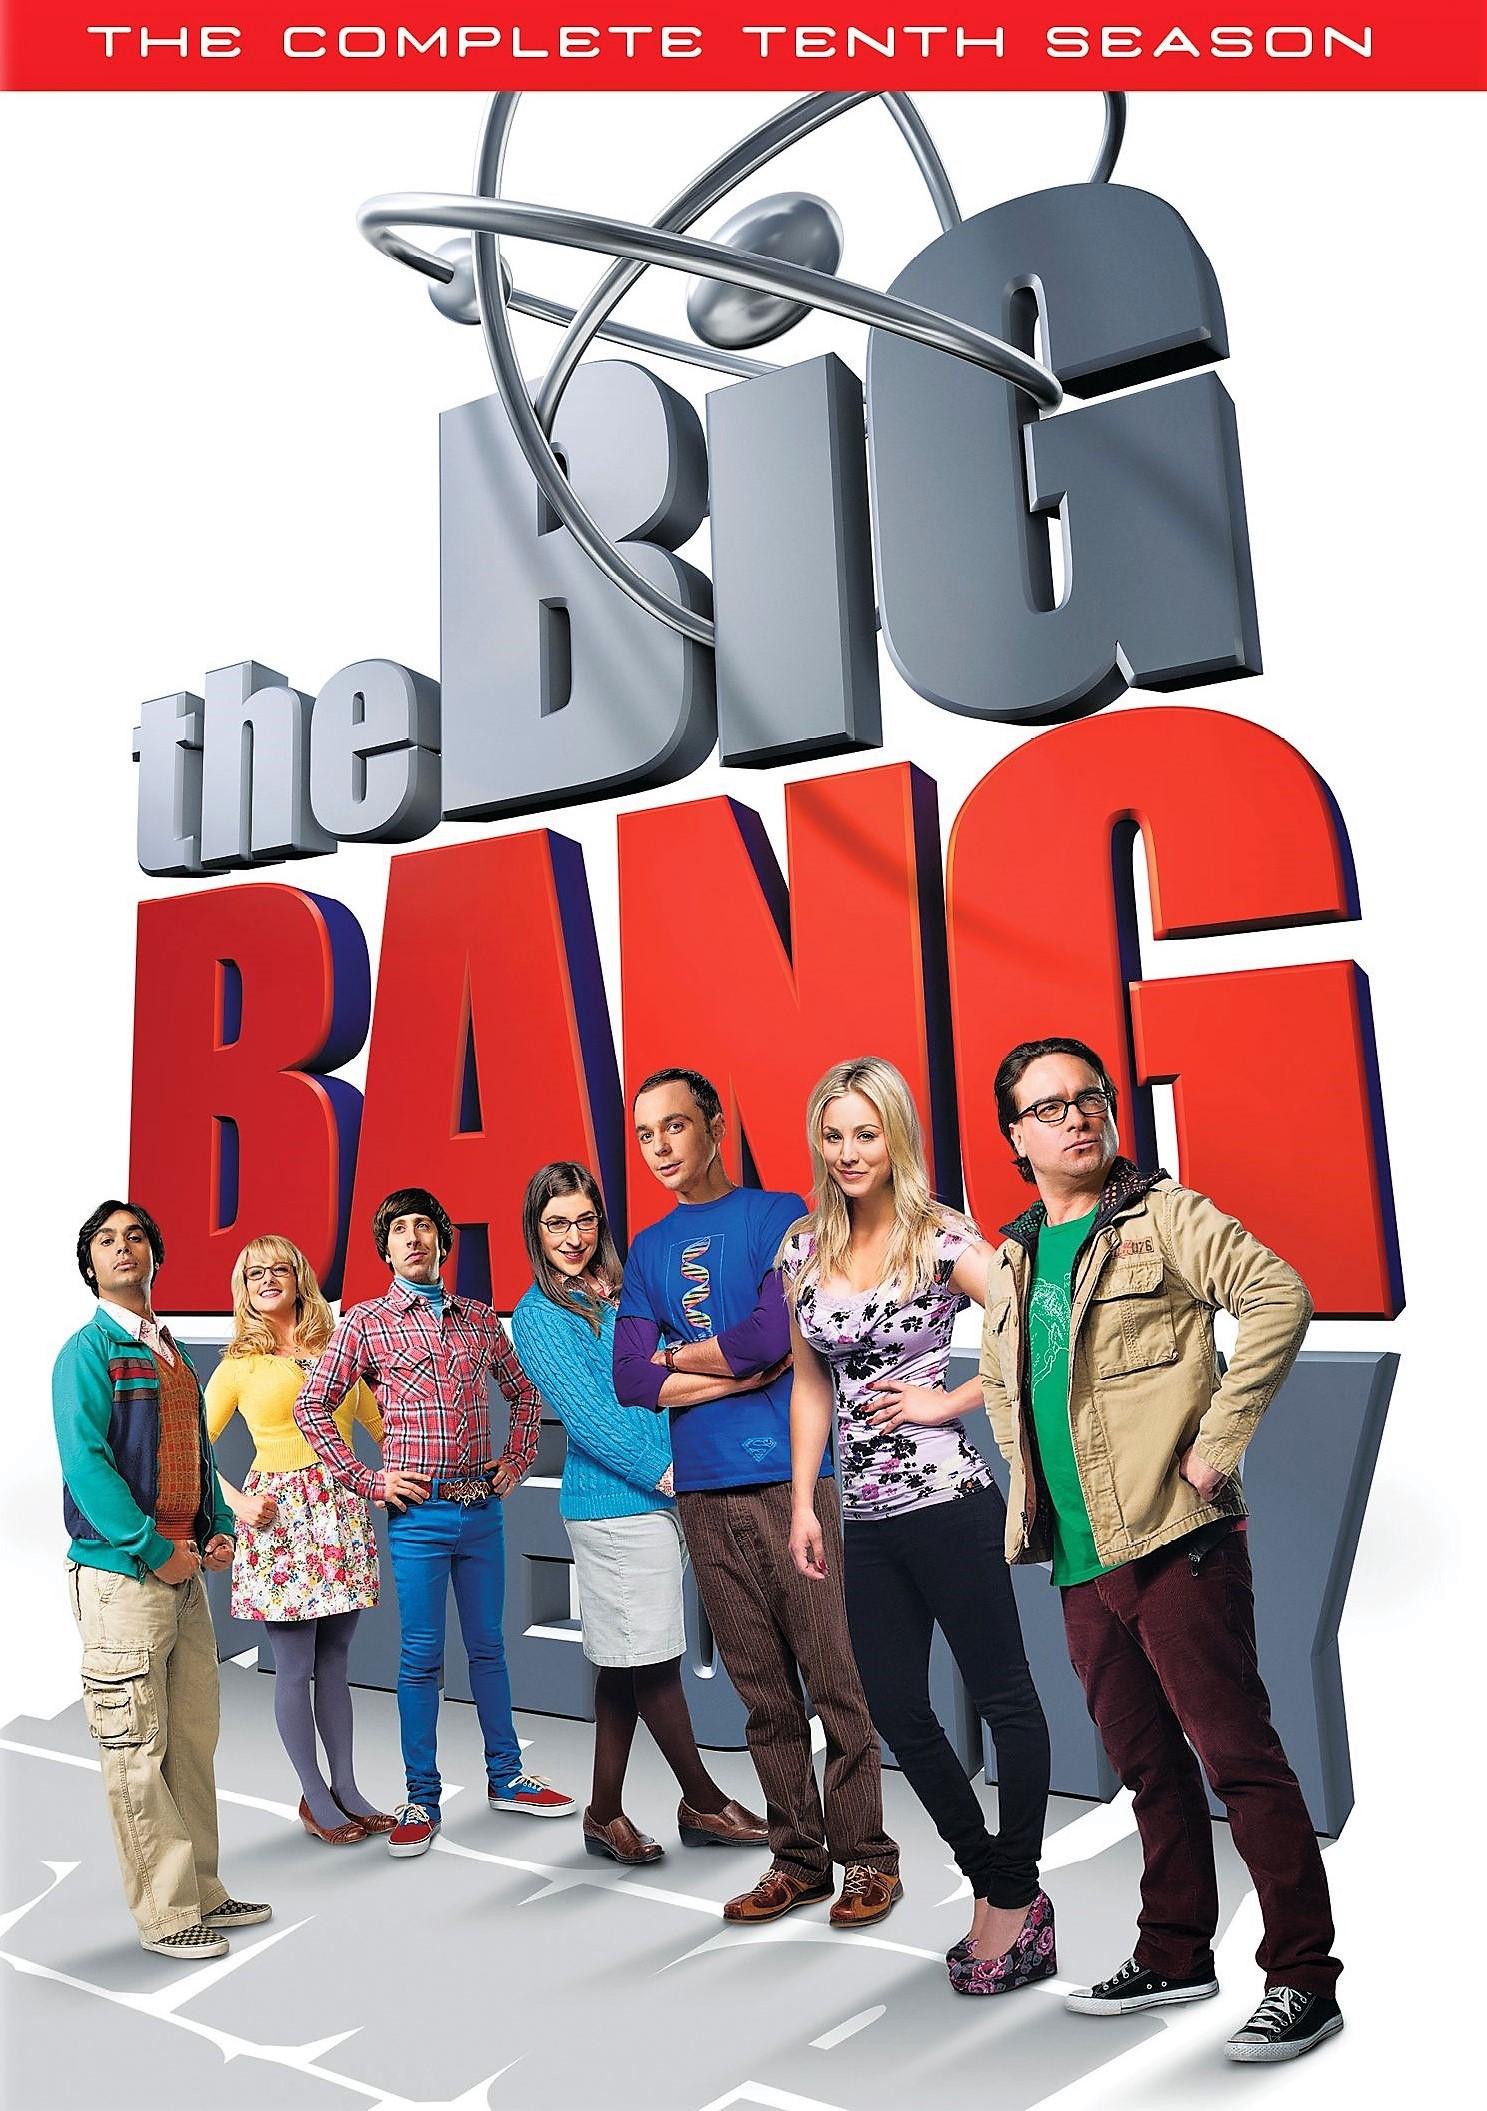 The Big Bang Theory S10 + Extras x265 10Bits 1080p